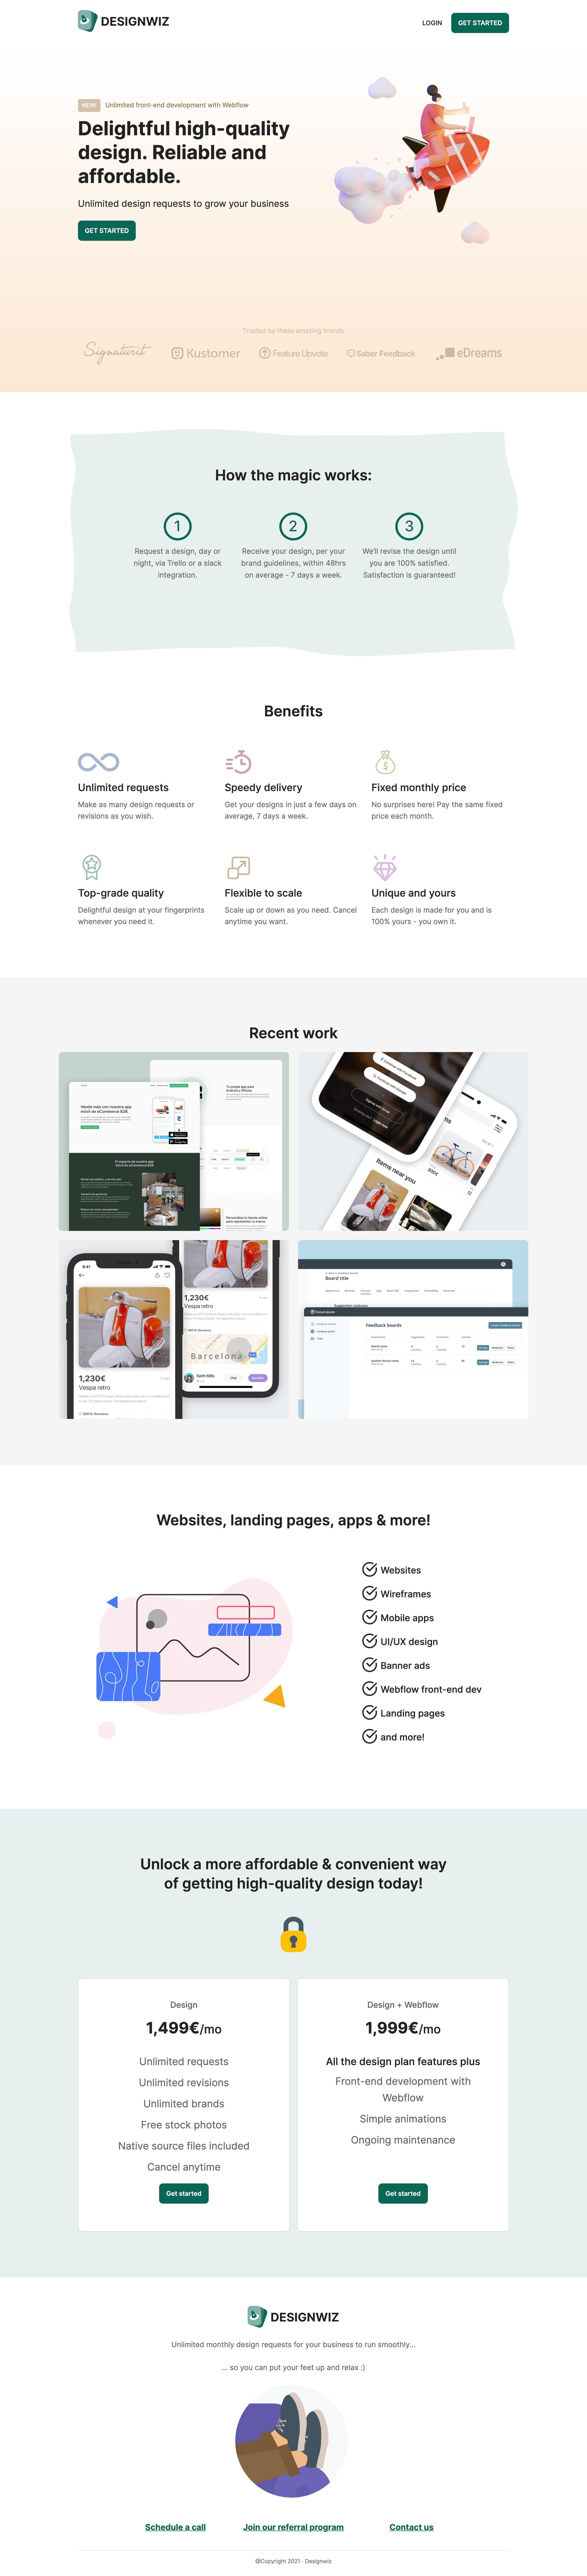 Designwiz Website Screenshot